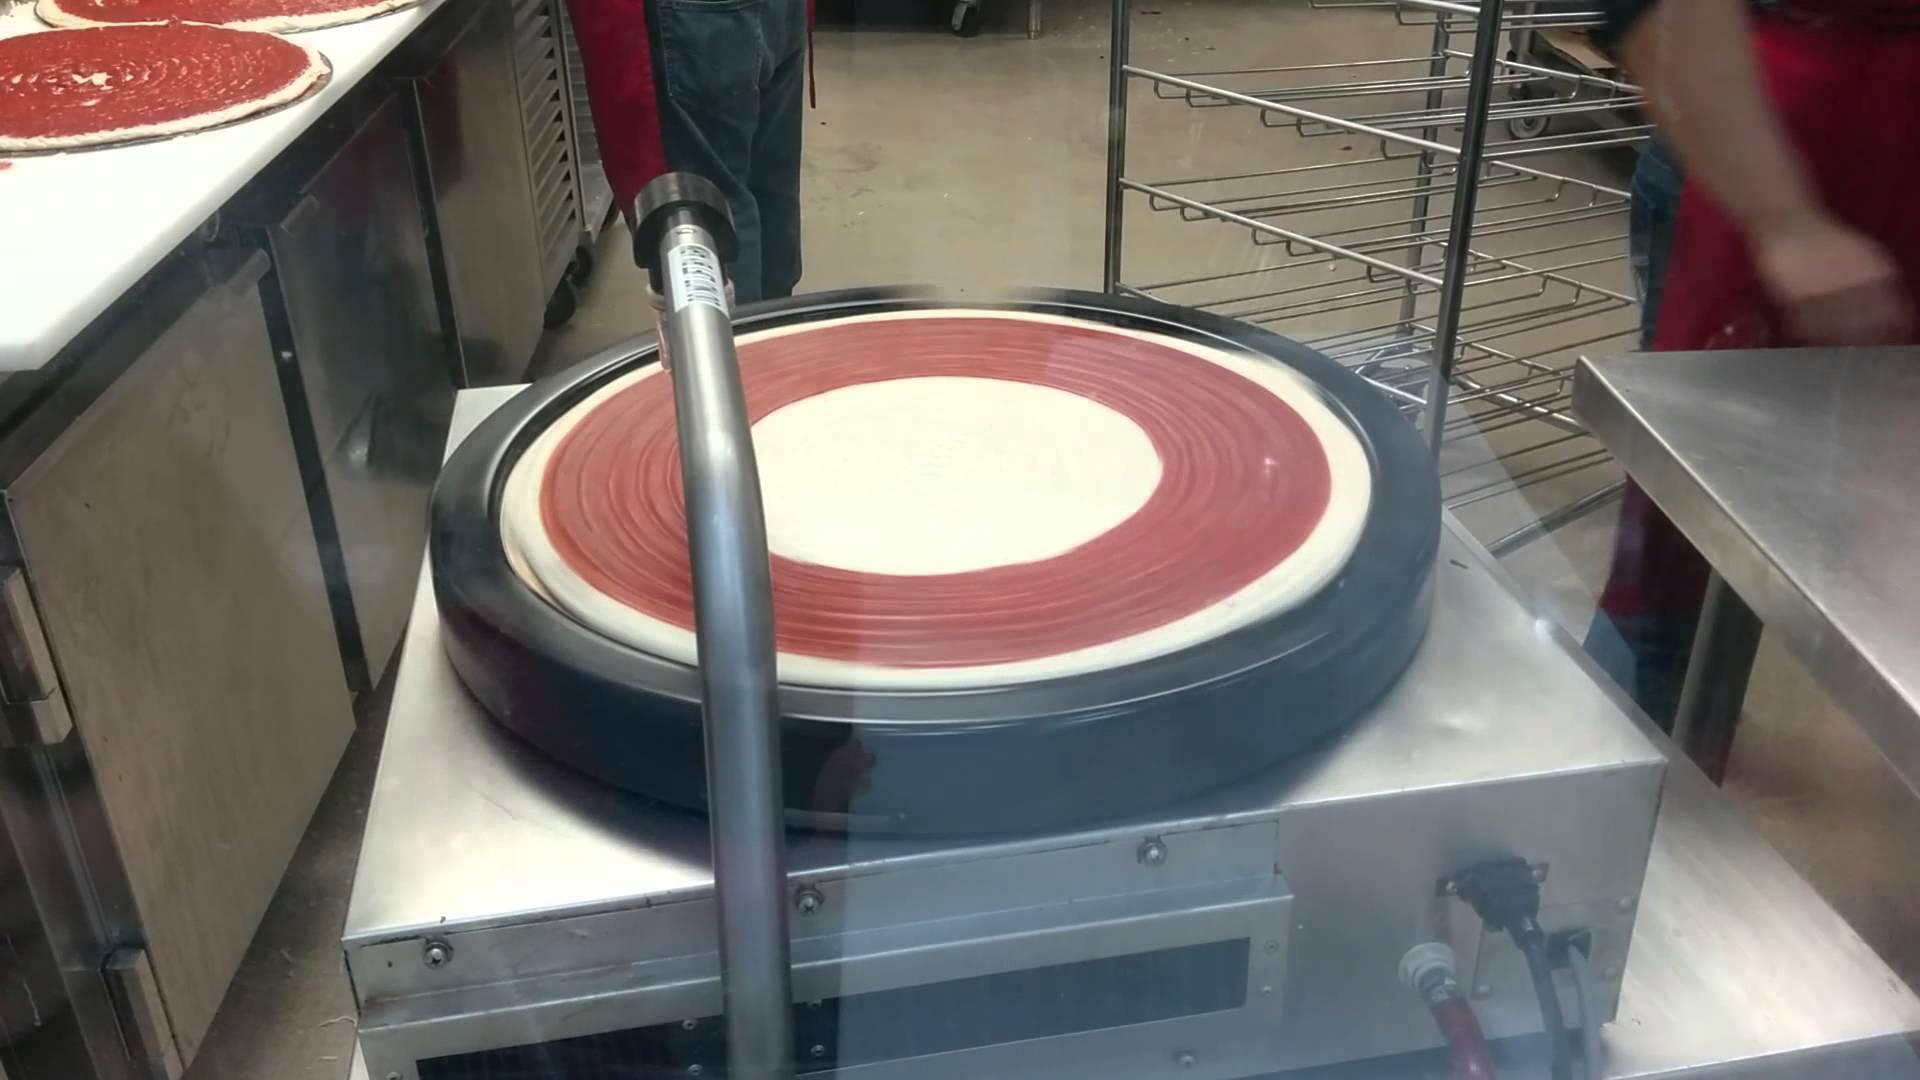 The Magic Pizza Sauce Machine that Sauces Pizzas at Costco